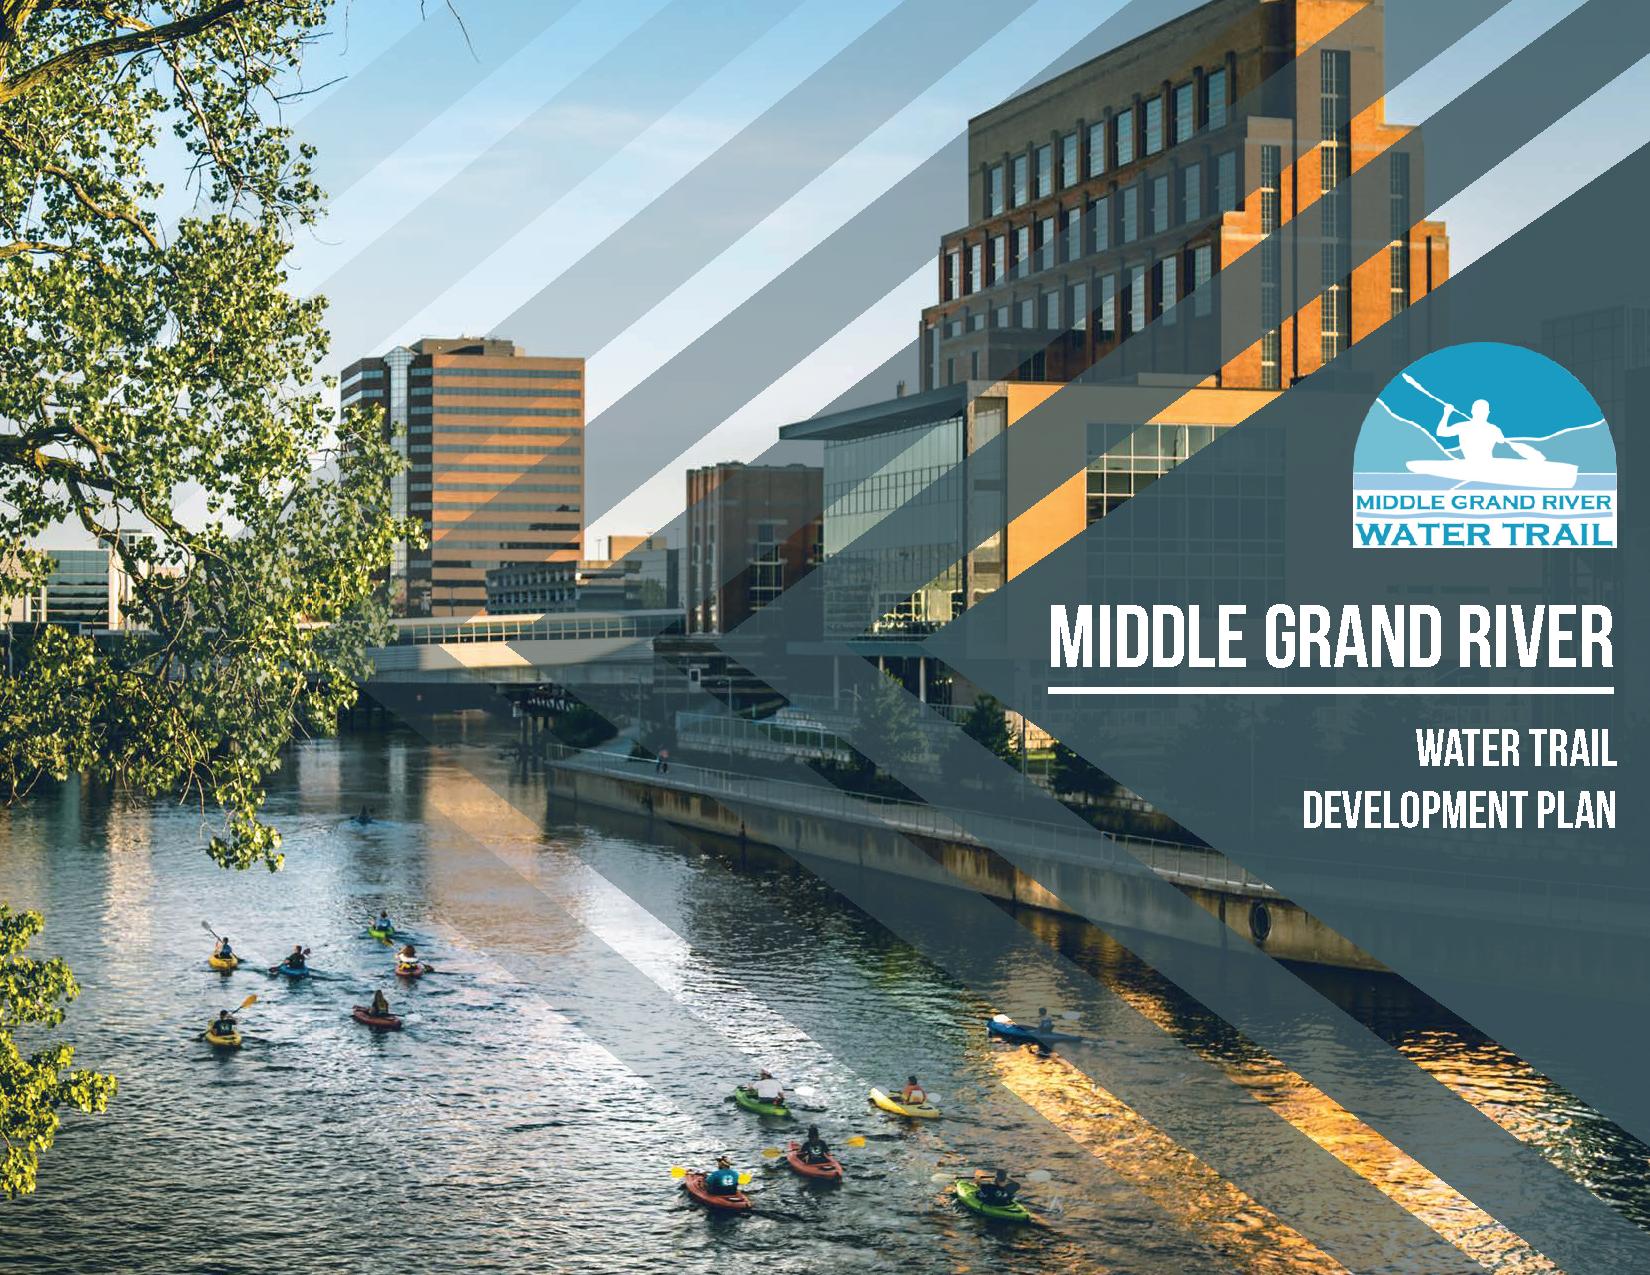 Middle Grand River Water Trail Development Plan